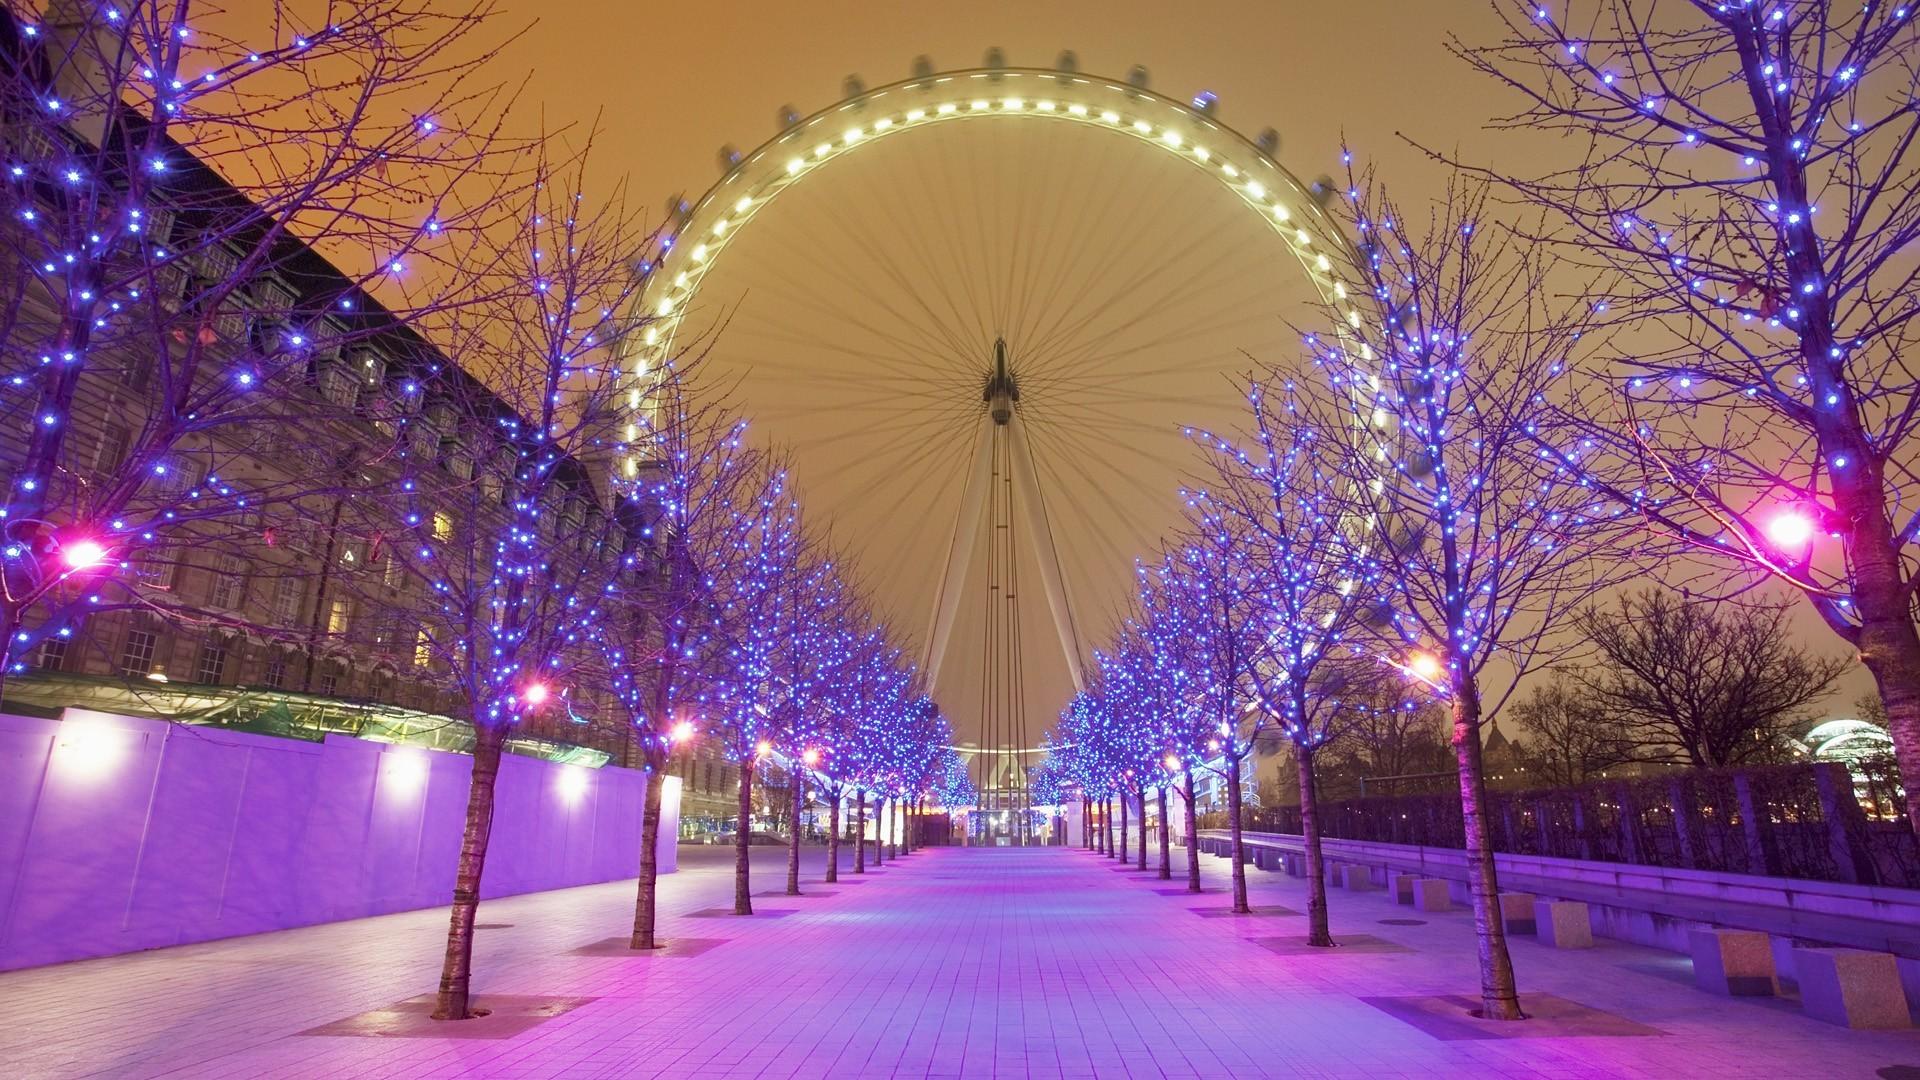 Desktop HD Christmas Lights Pictures.